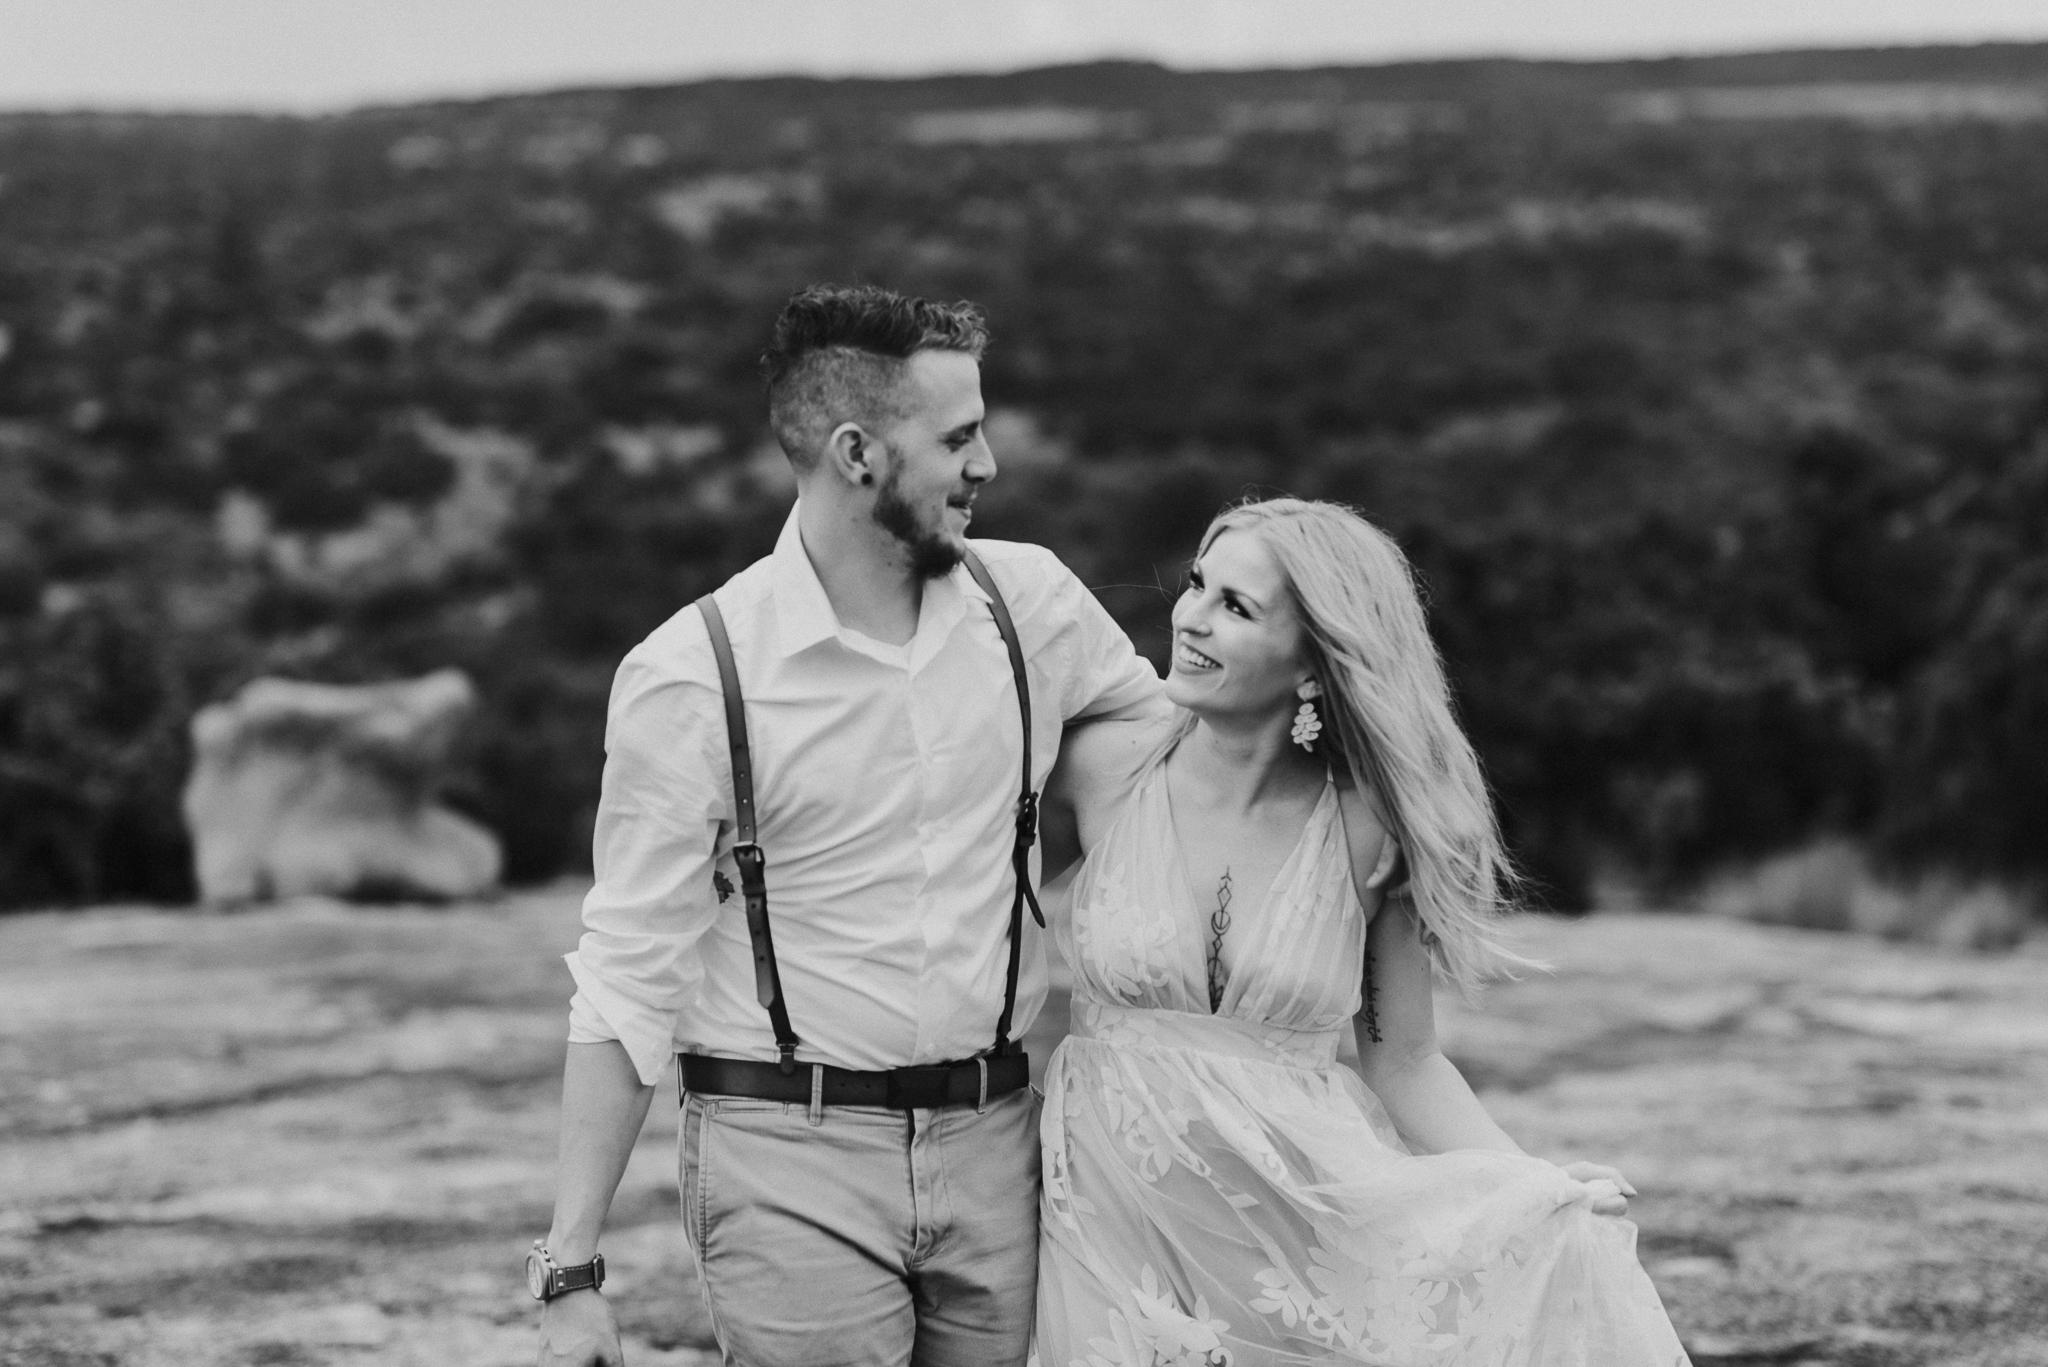 texas-elopement-photographer-enchanted-rock-33-blog.jpg